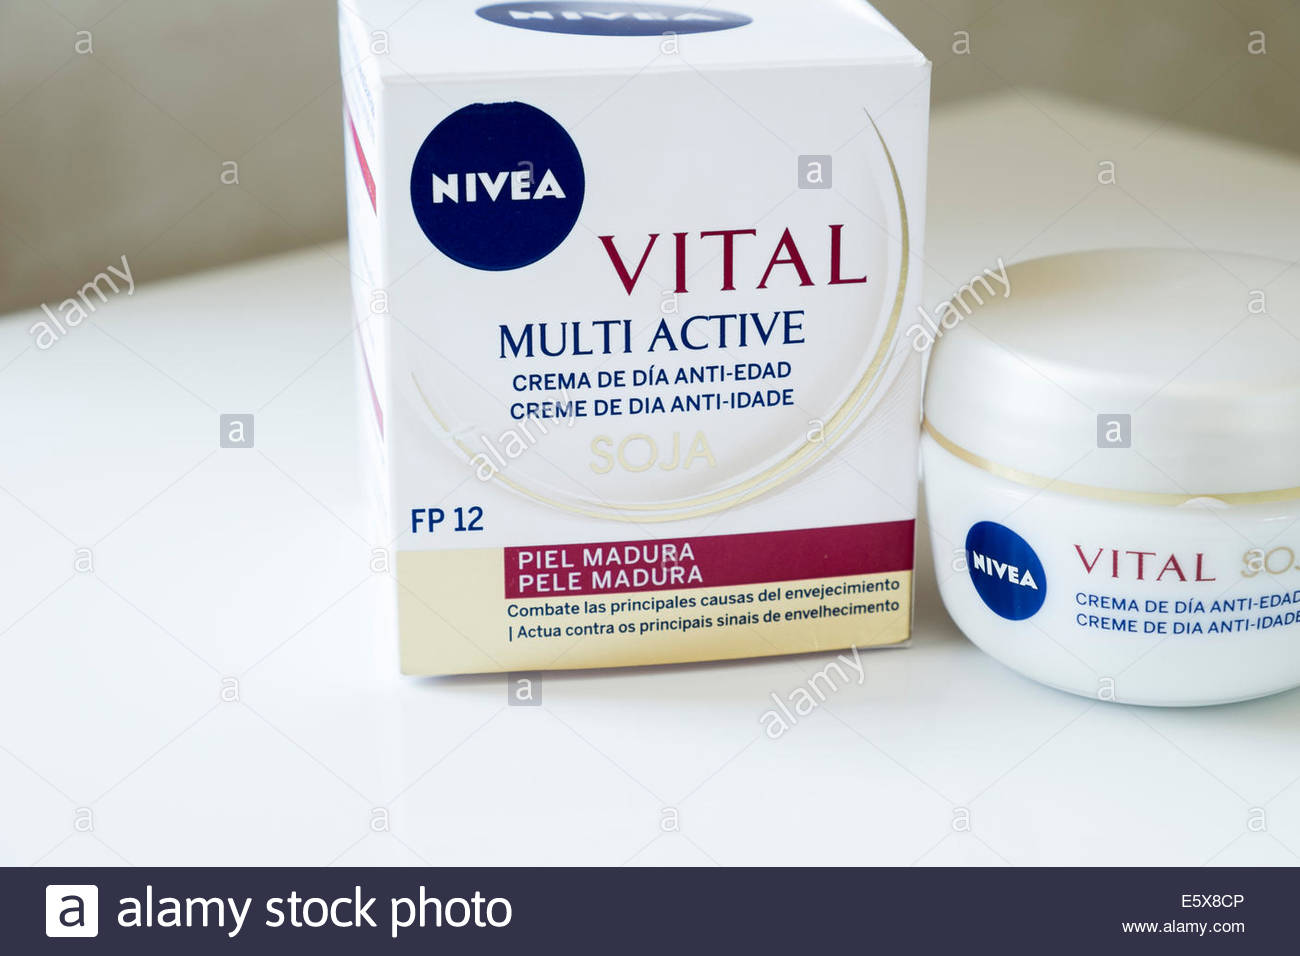 Nivea Vital soja moisturising day cream as sold in Portugal with box - Stock Image